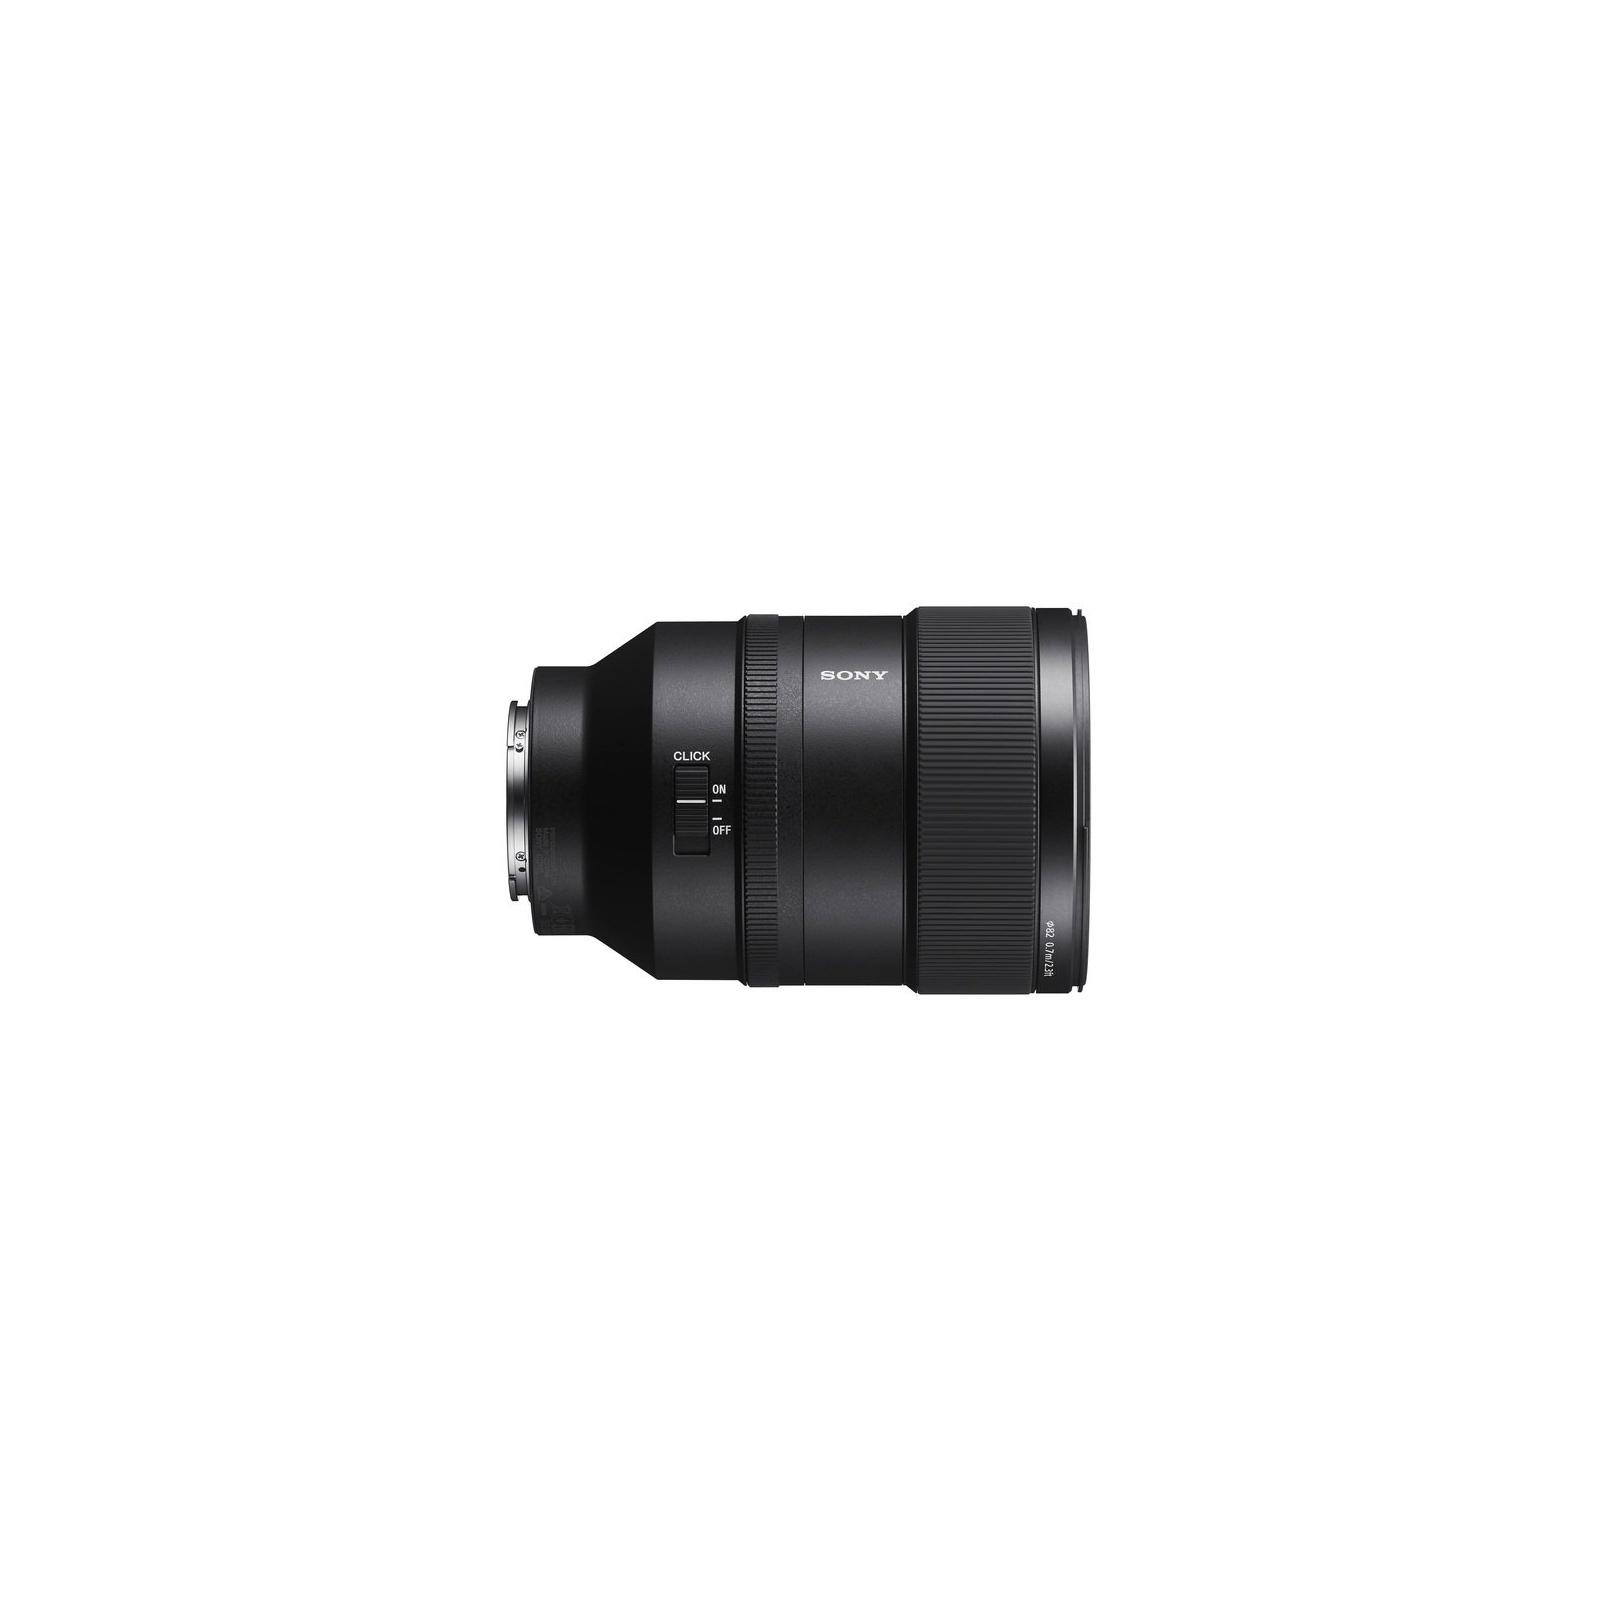 Объектив Sony 135mm, f/1.8 GM для камер NEX FF (SEL135F18GM.SYX) изображение 5